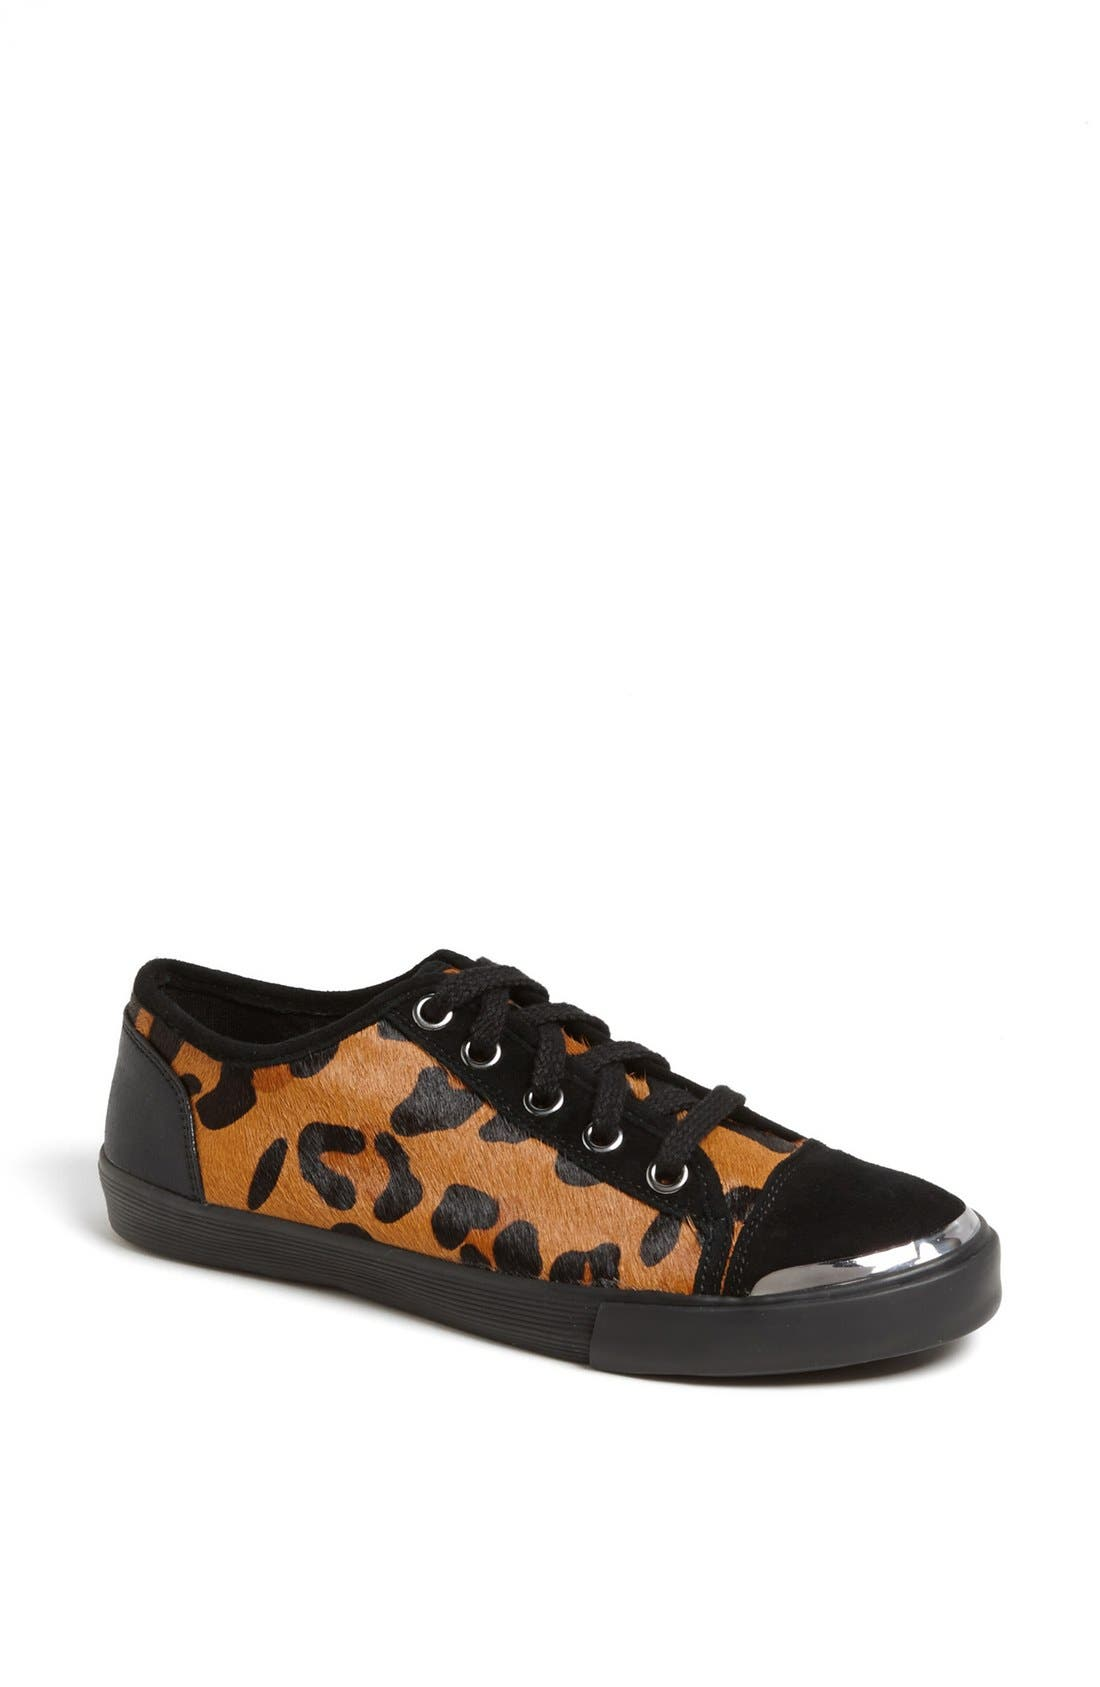 Alternate Image 1 Selected - Nine West 'Deanne' Leopard Print Sneaker